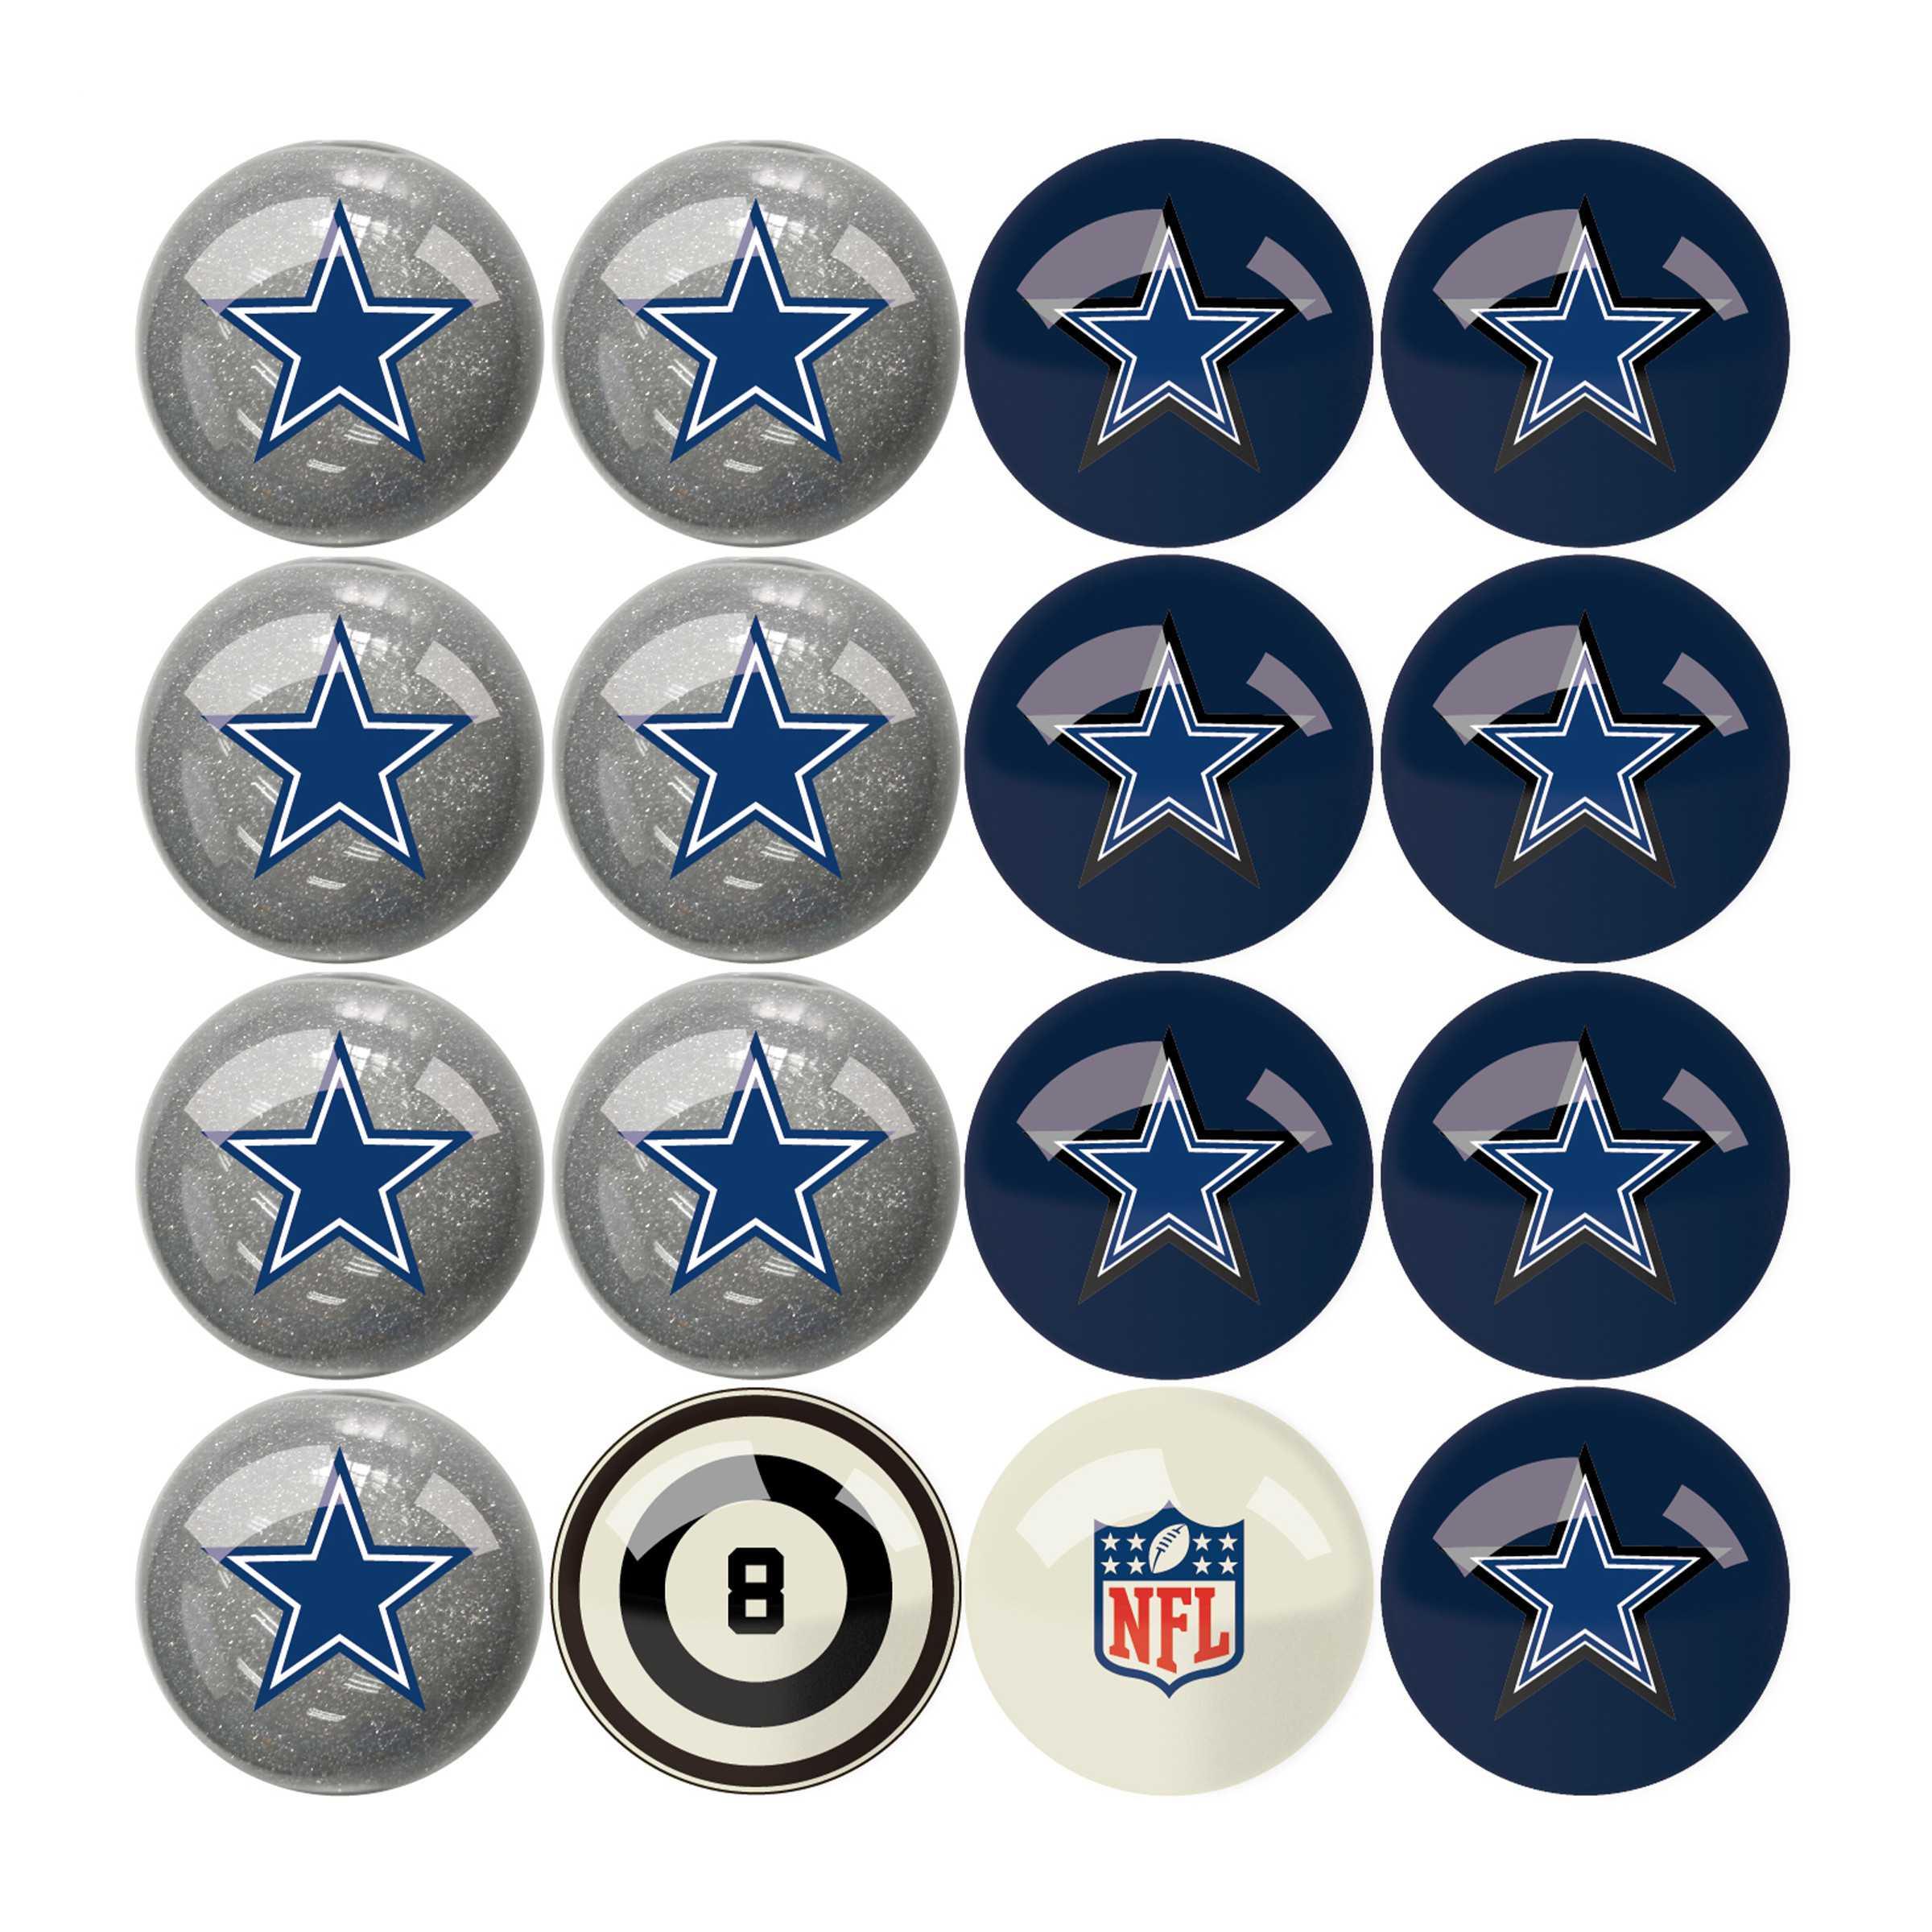 Dallas Cowboys Billiard Balls with Numbers